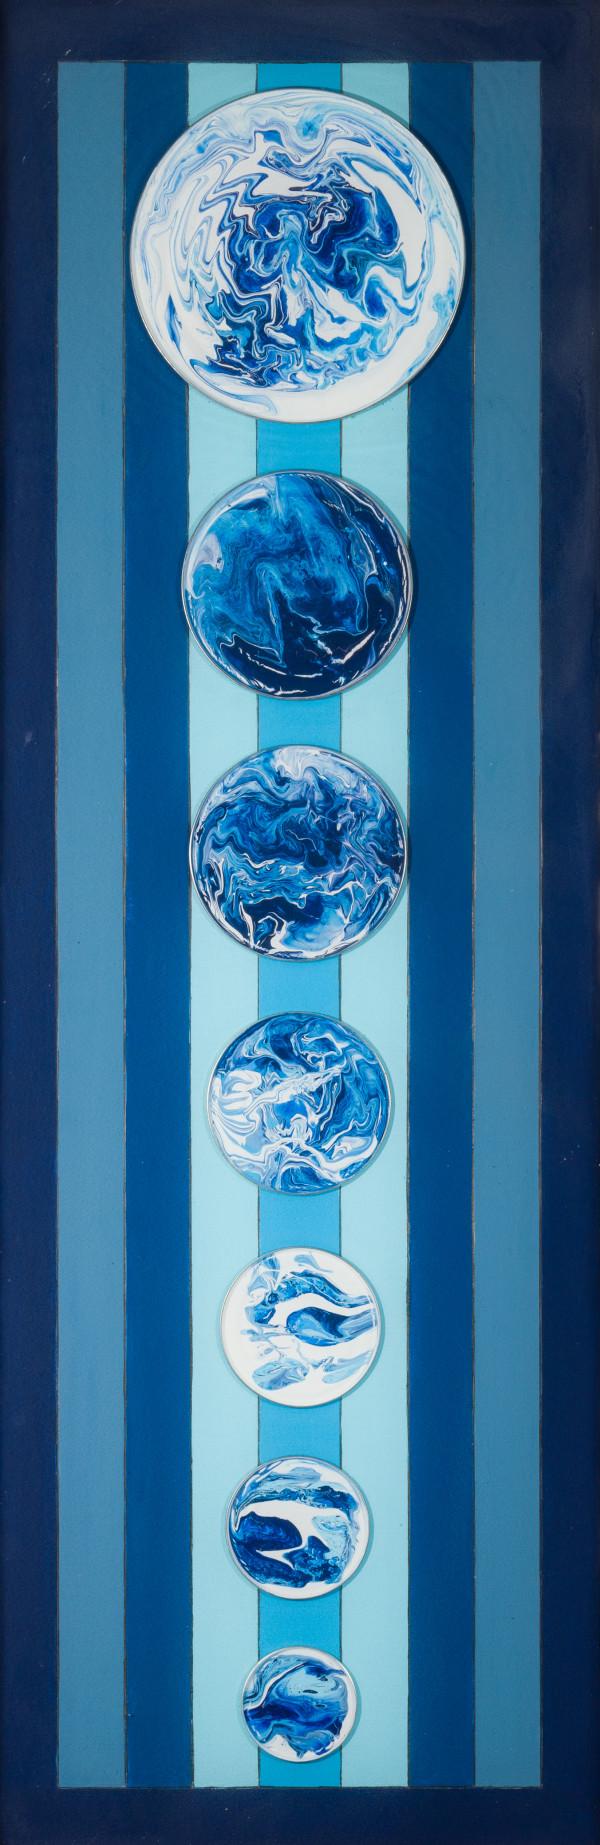 Seven Oceans by Claudia Lohmann